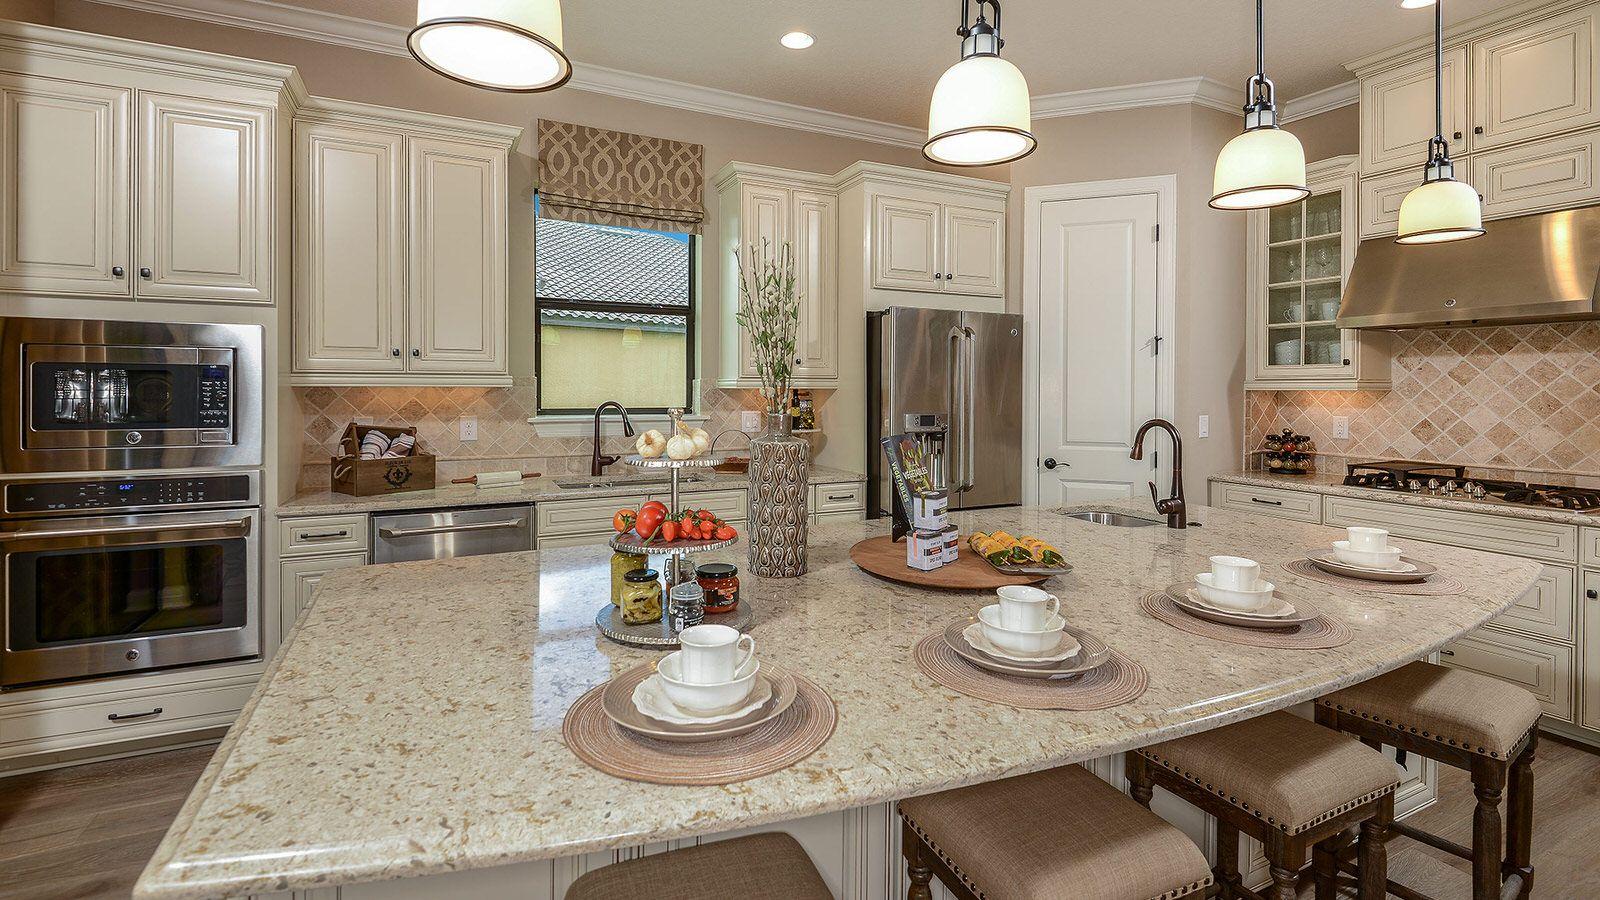 Kitchen featured in the Lazio 3 car By Taylor Morrison in Sarasota-Bradenton, FL